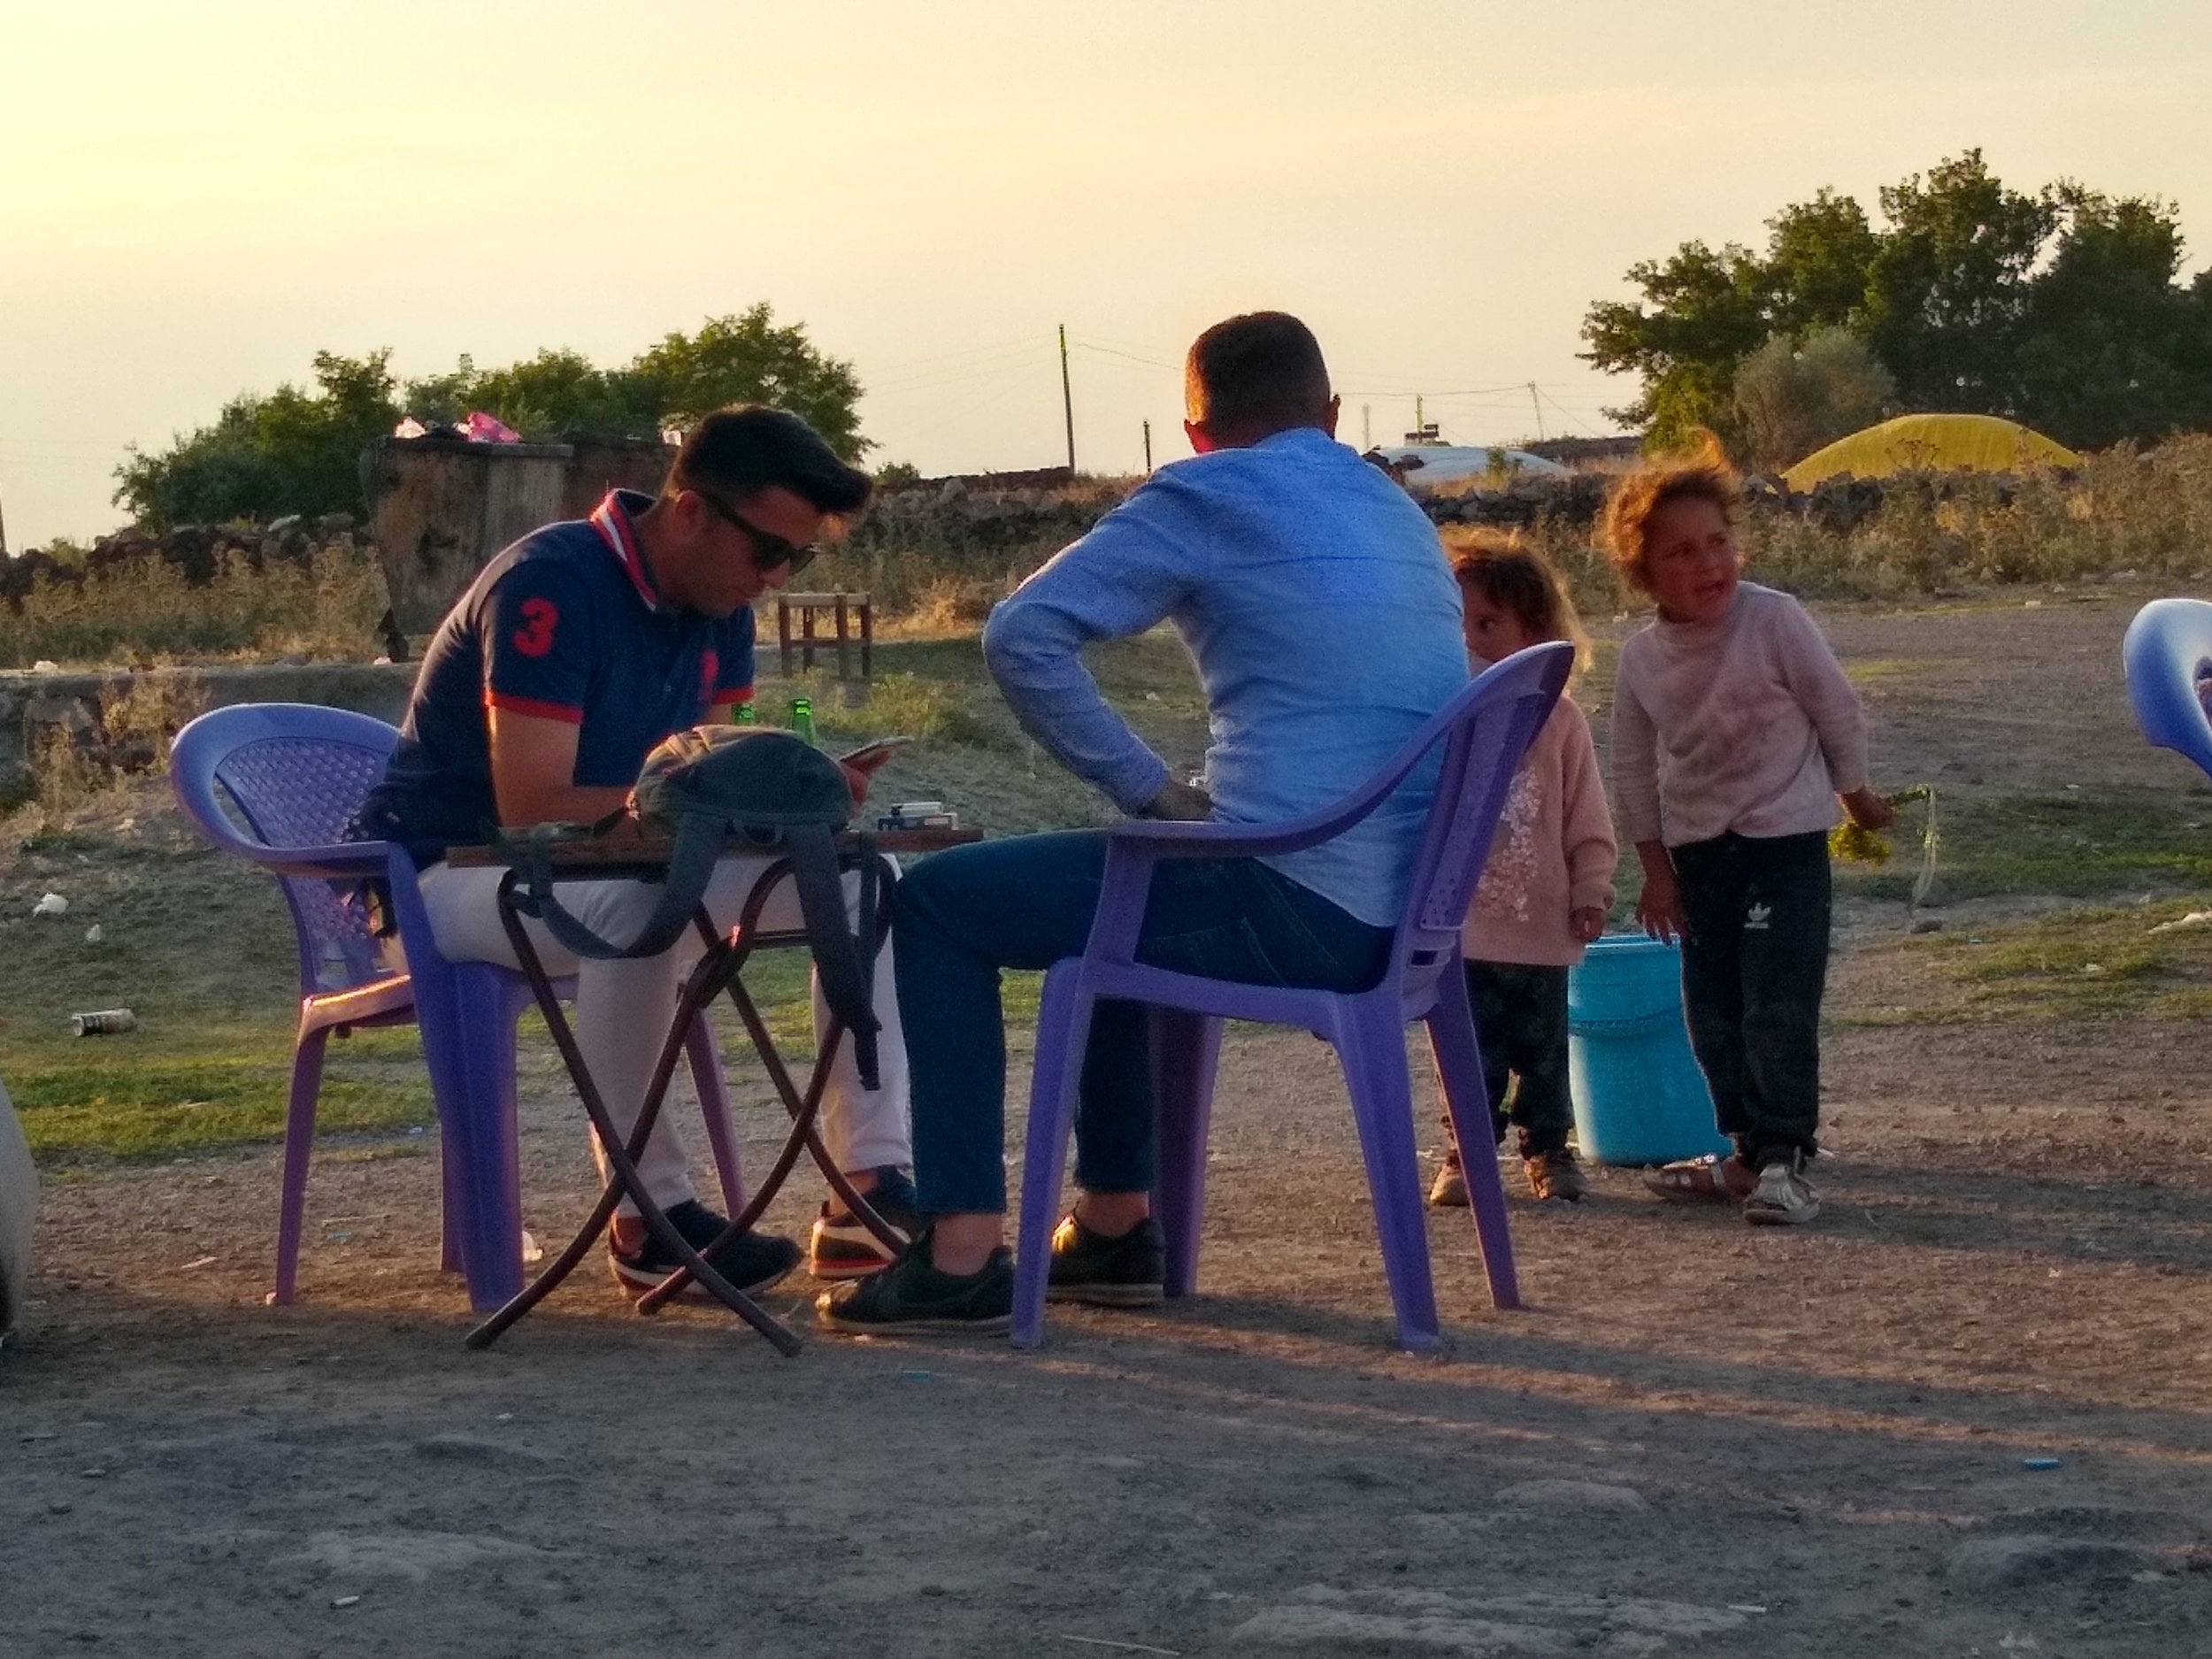 Two plain-clothes border patrol officers having tea.